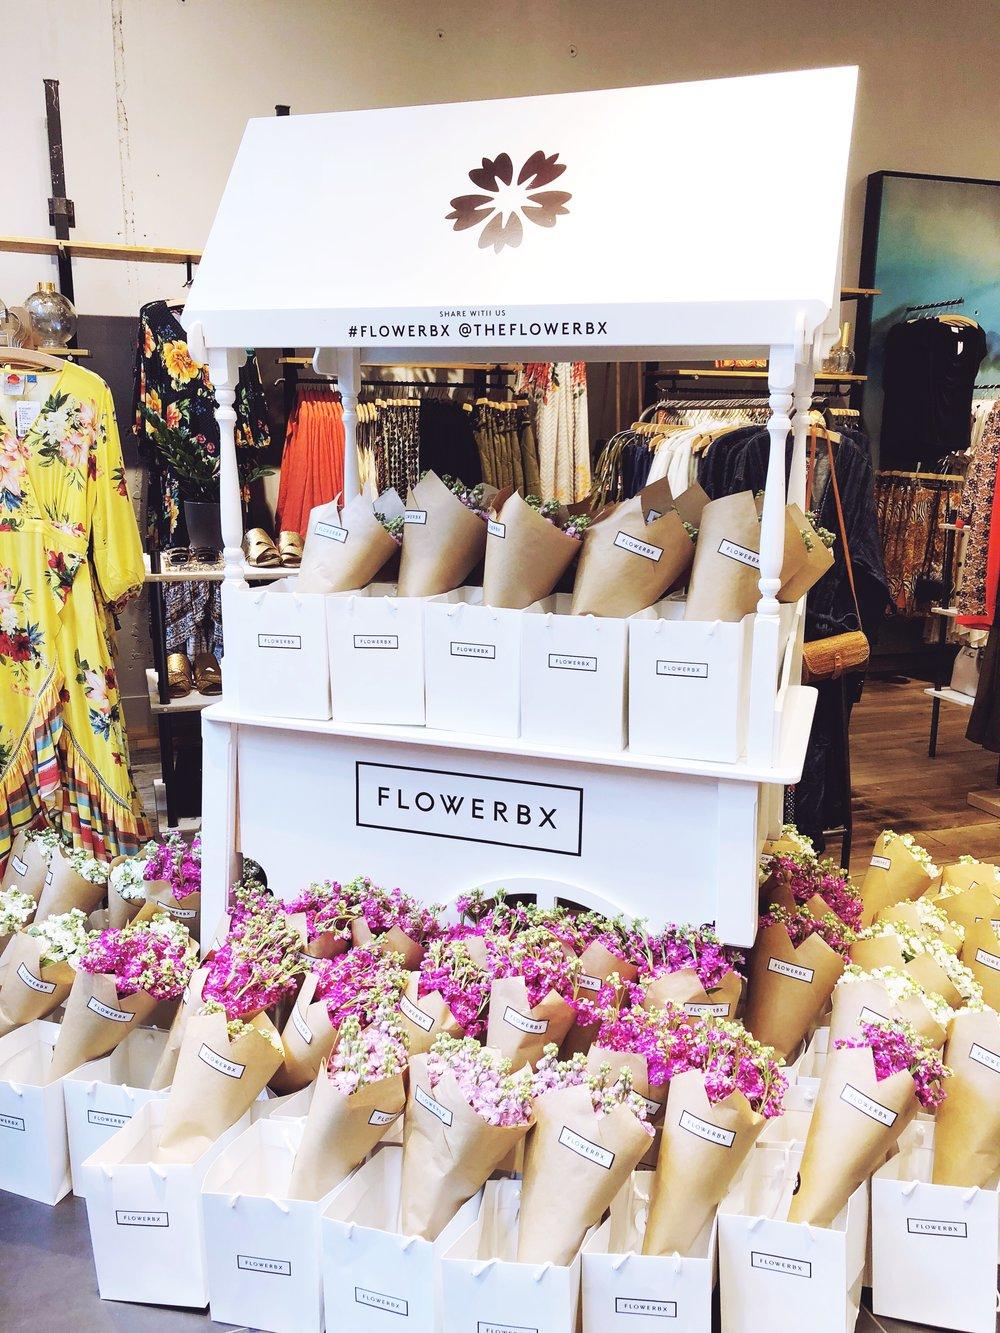 FLOWERBX Germany pop-up at Anthropologie Düsseldorf